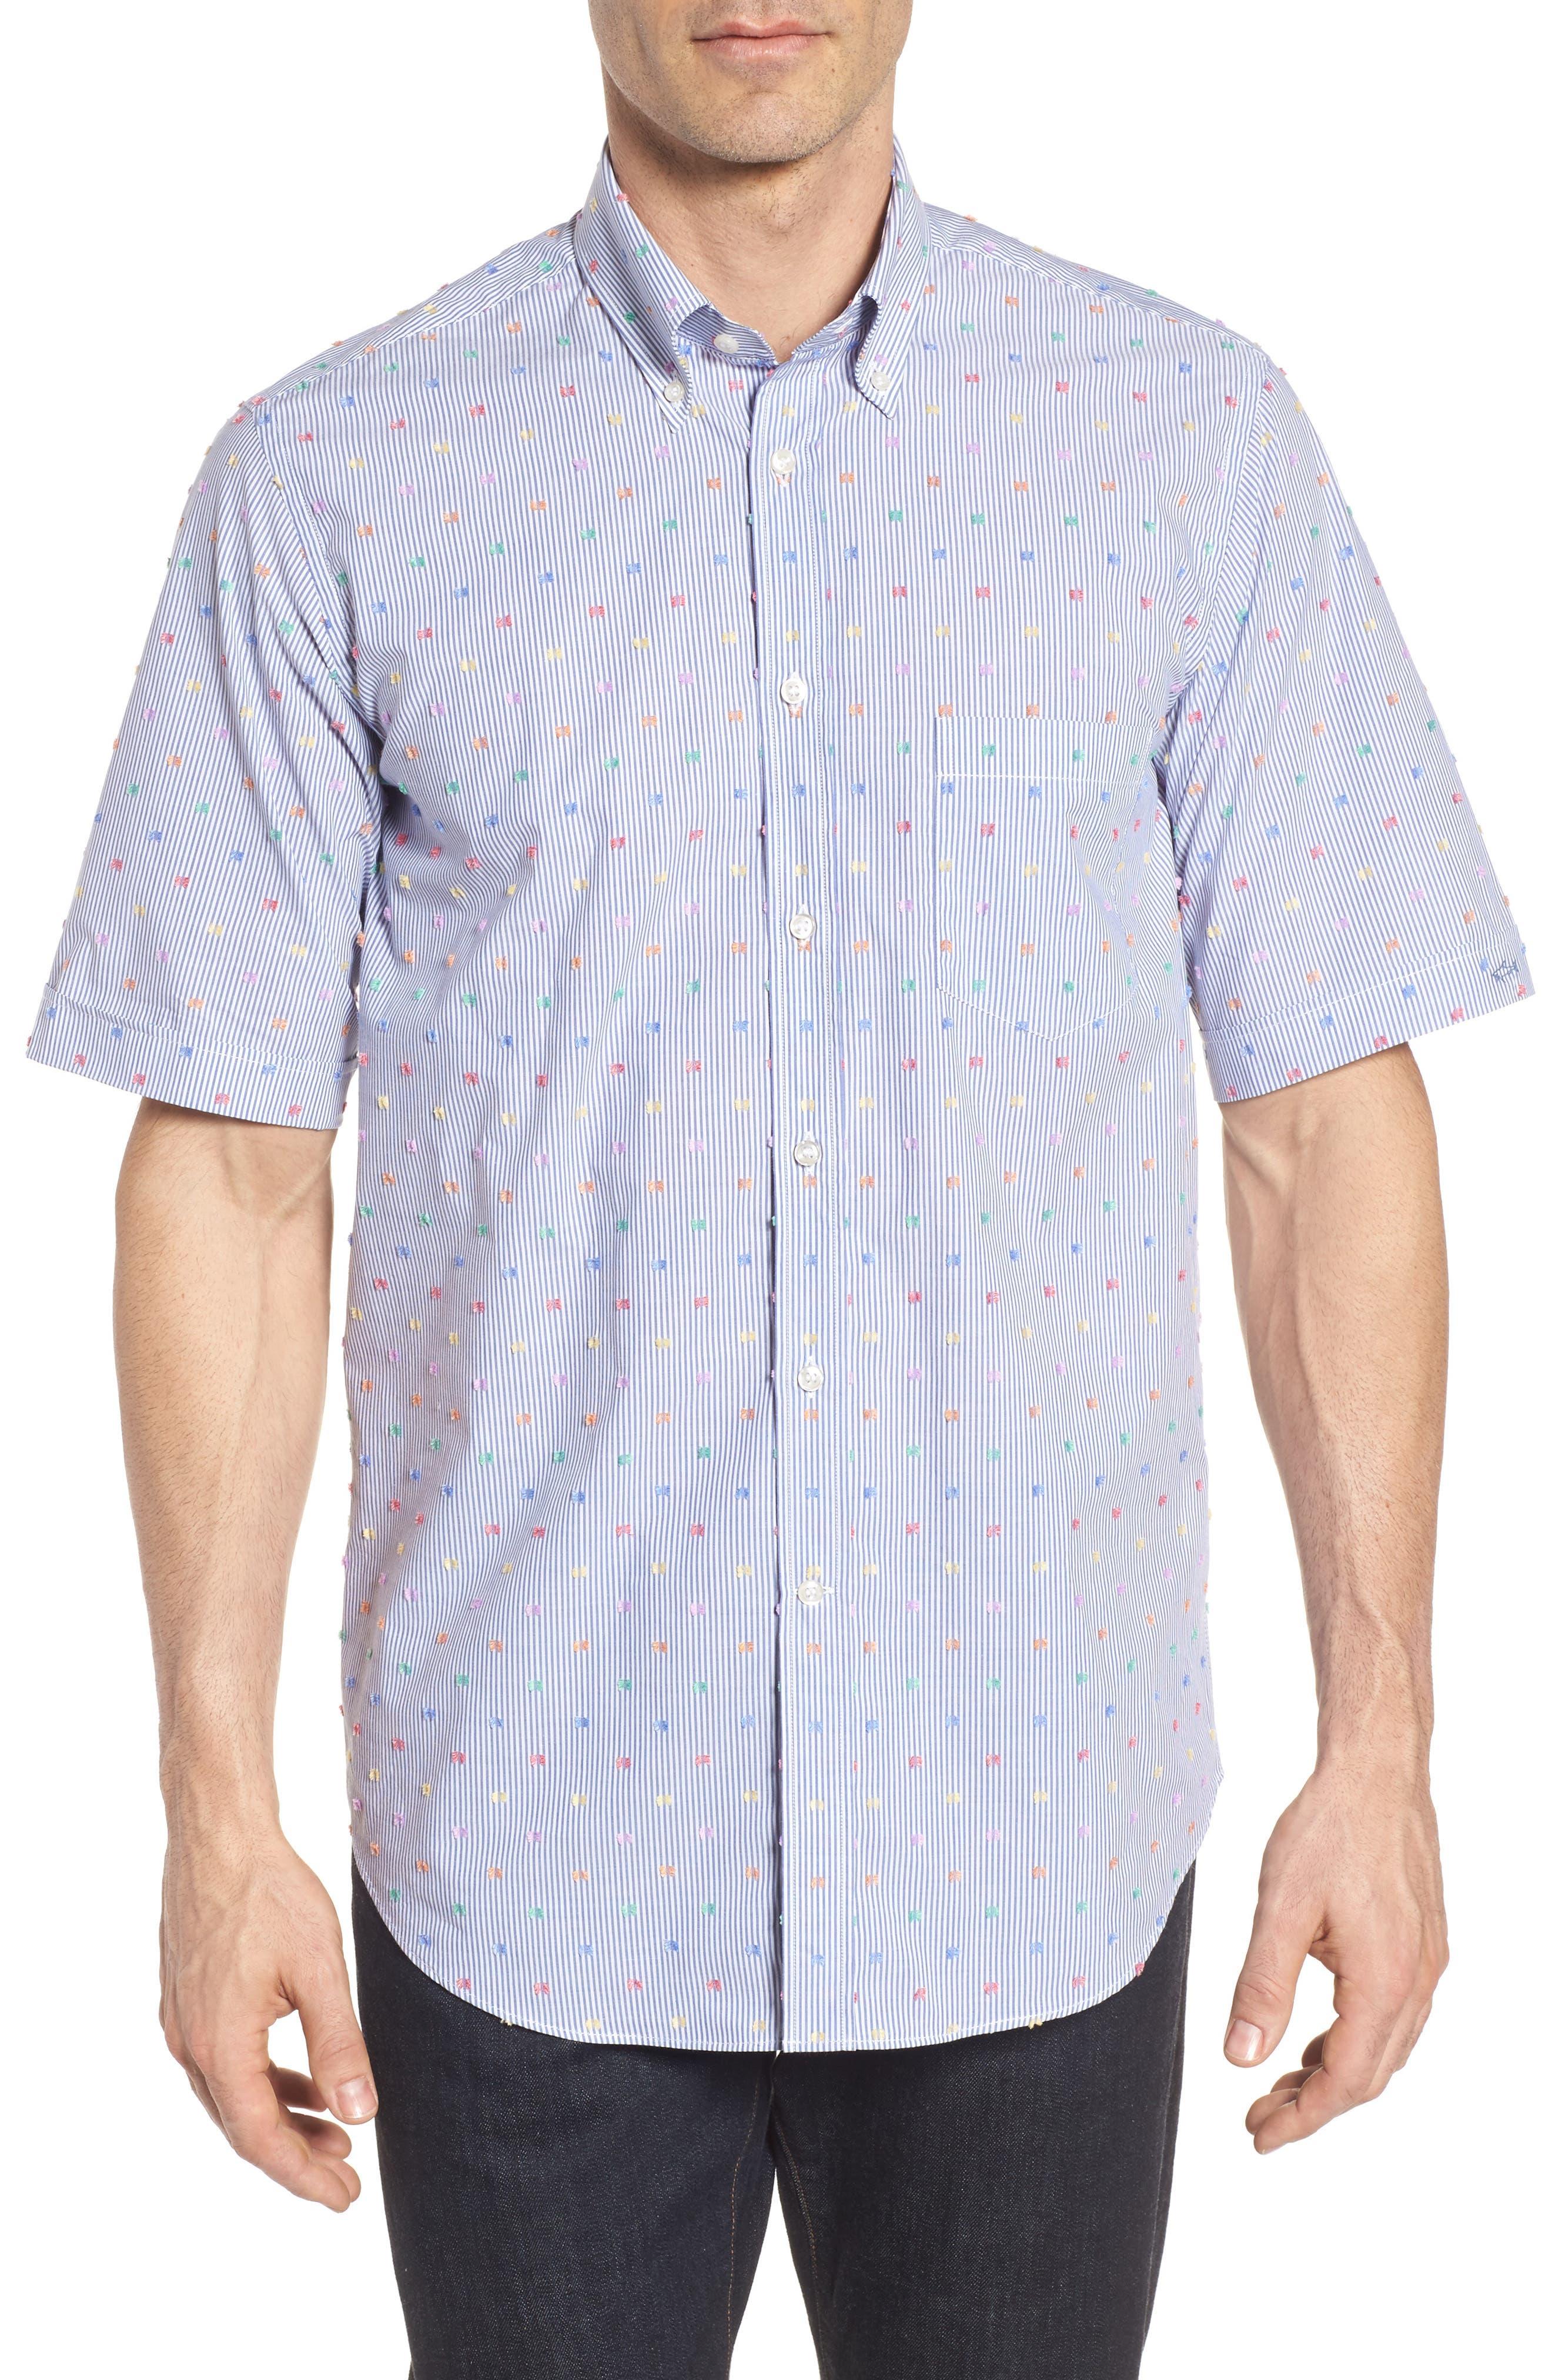 Paul&Shark Fin Stripe Sport Shirt,                         Main,                         color, Blue/ White/ Multi